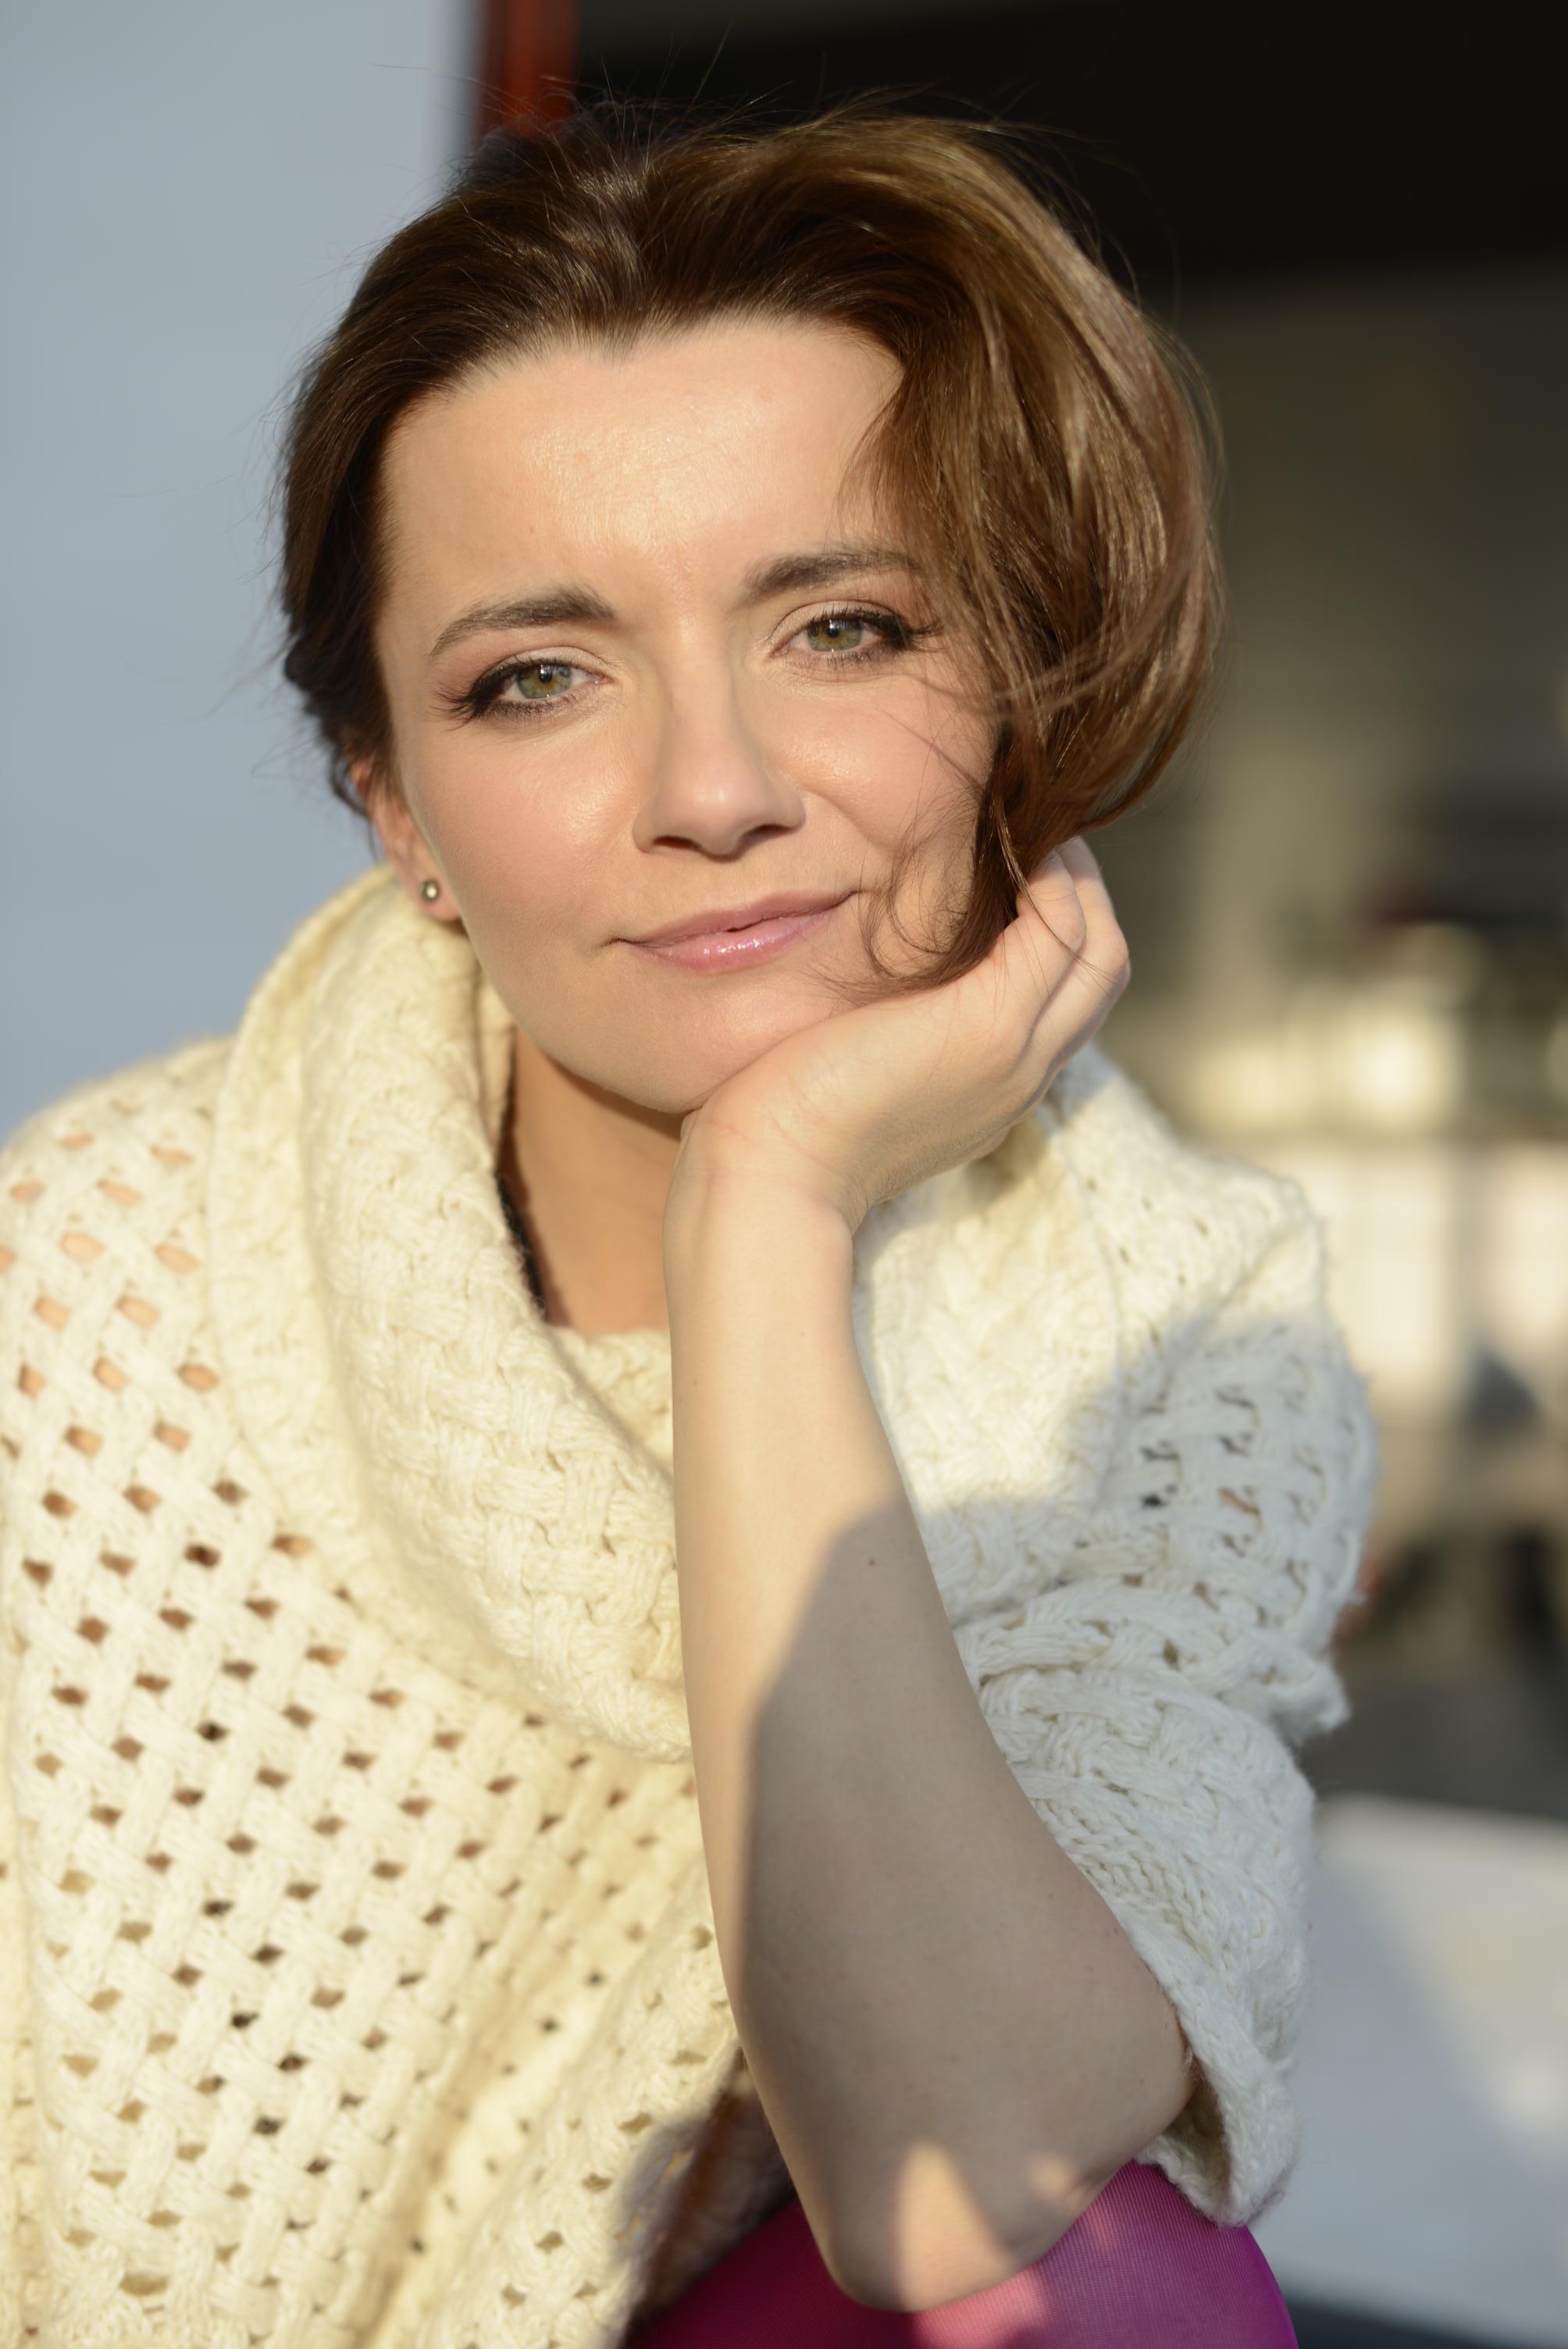 Agata Kucińska